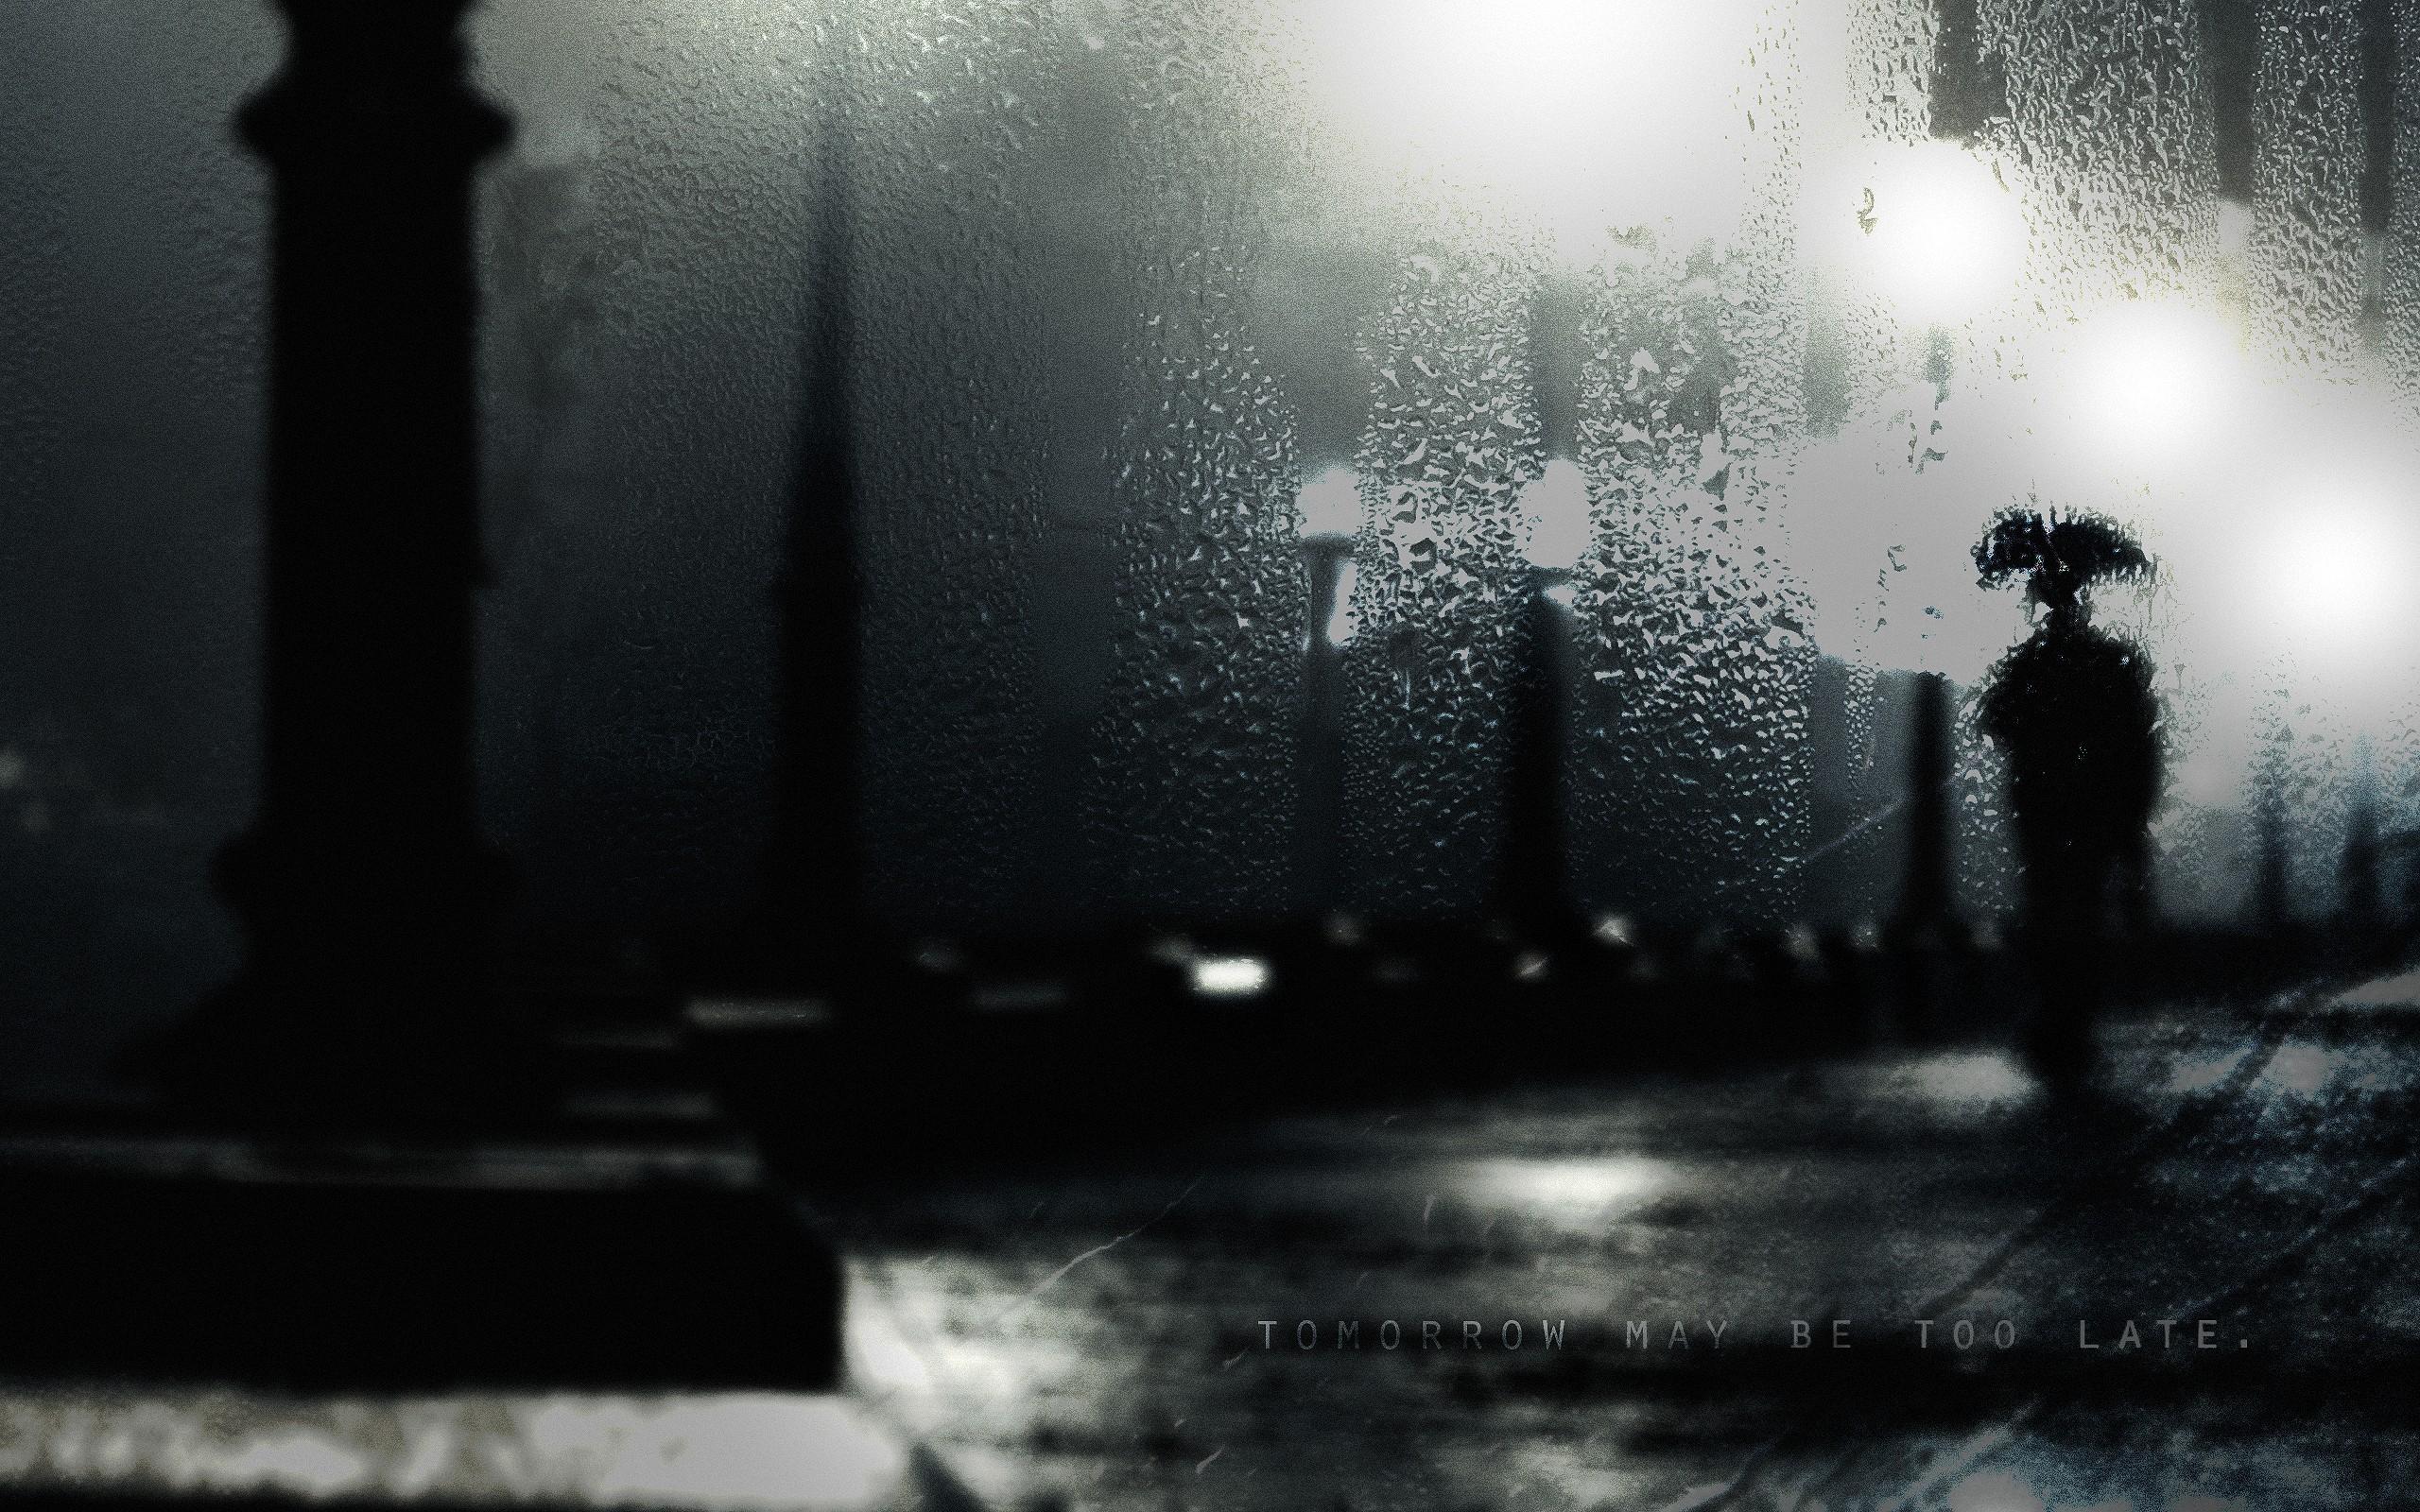 Sad Iphone Wallpaper Rain Full Hd Wallpaper And Background Image 2560x1600